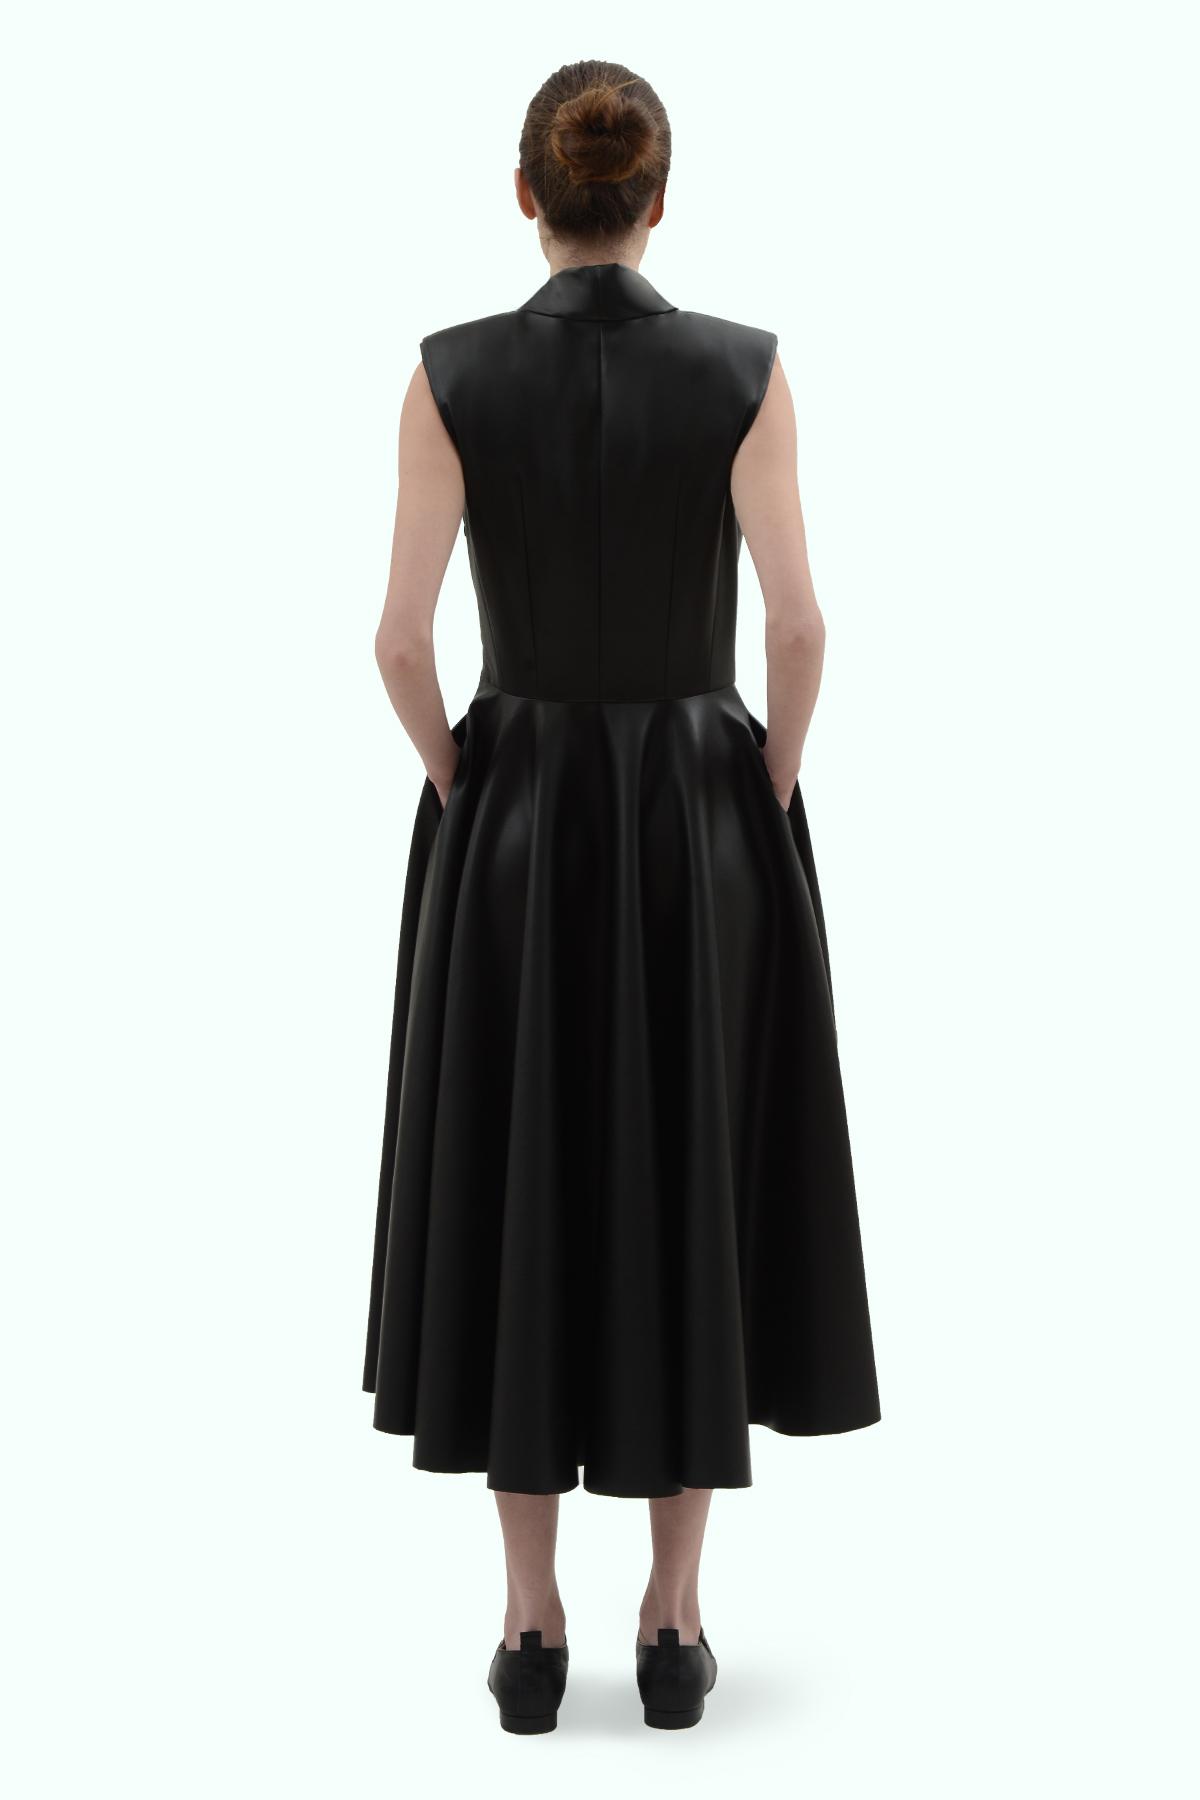 Black vegan leather bow dress 4